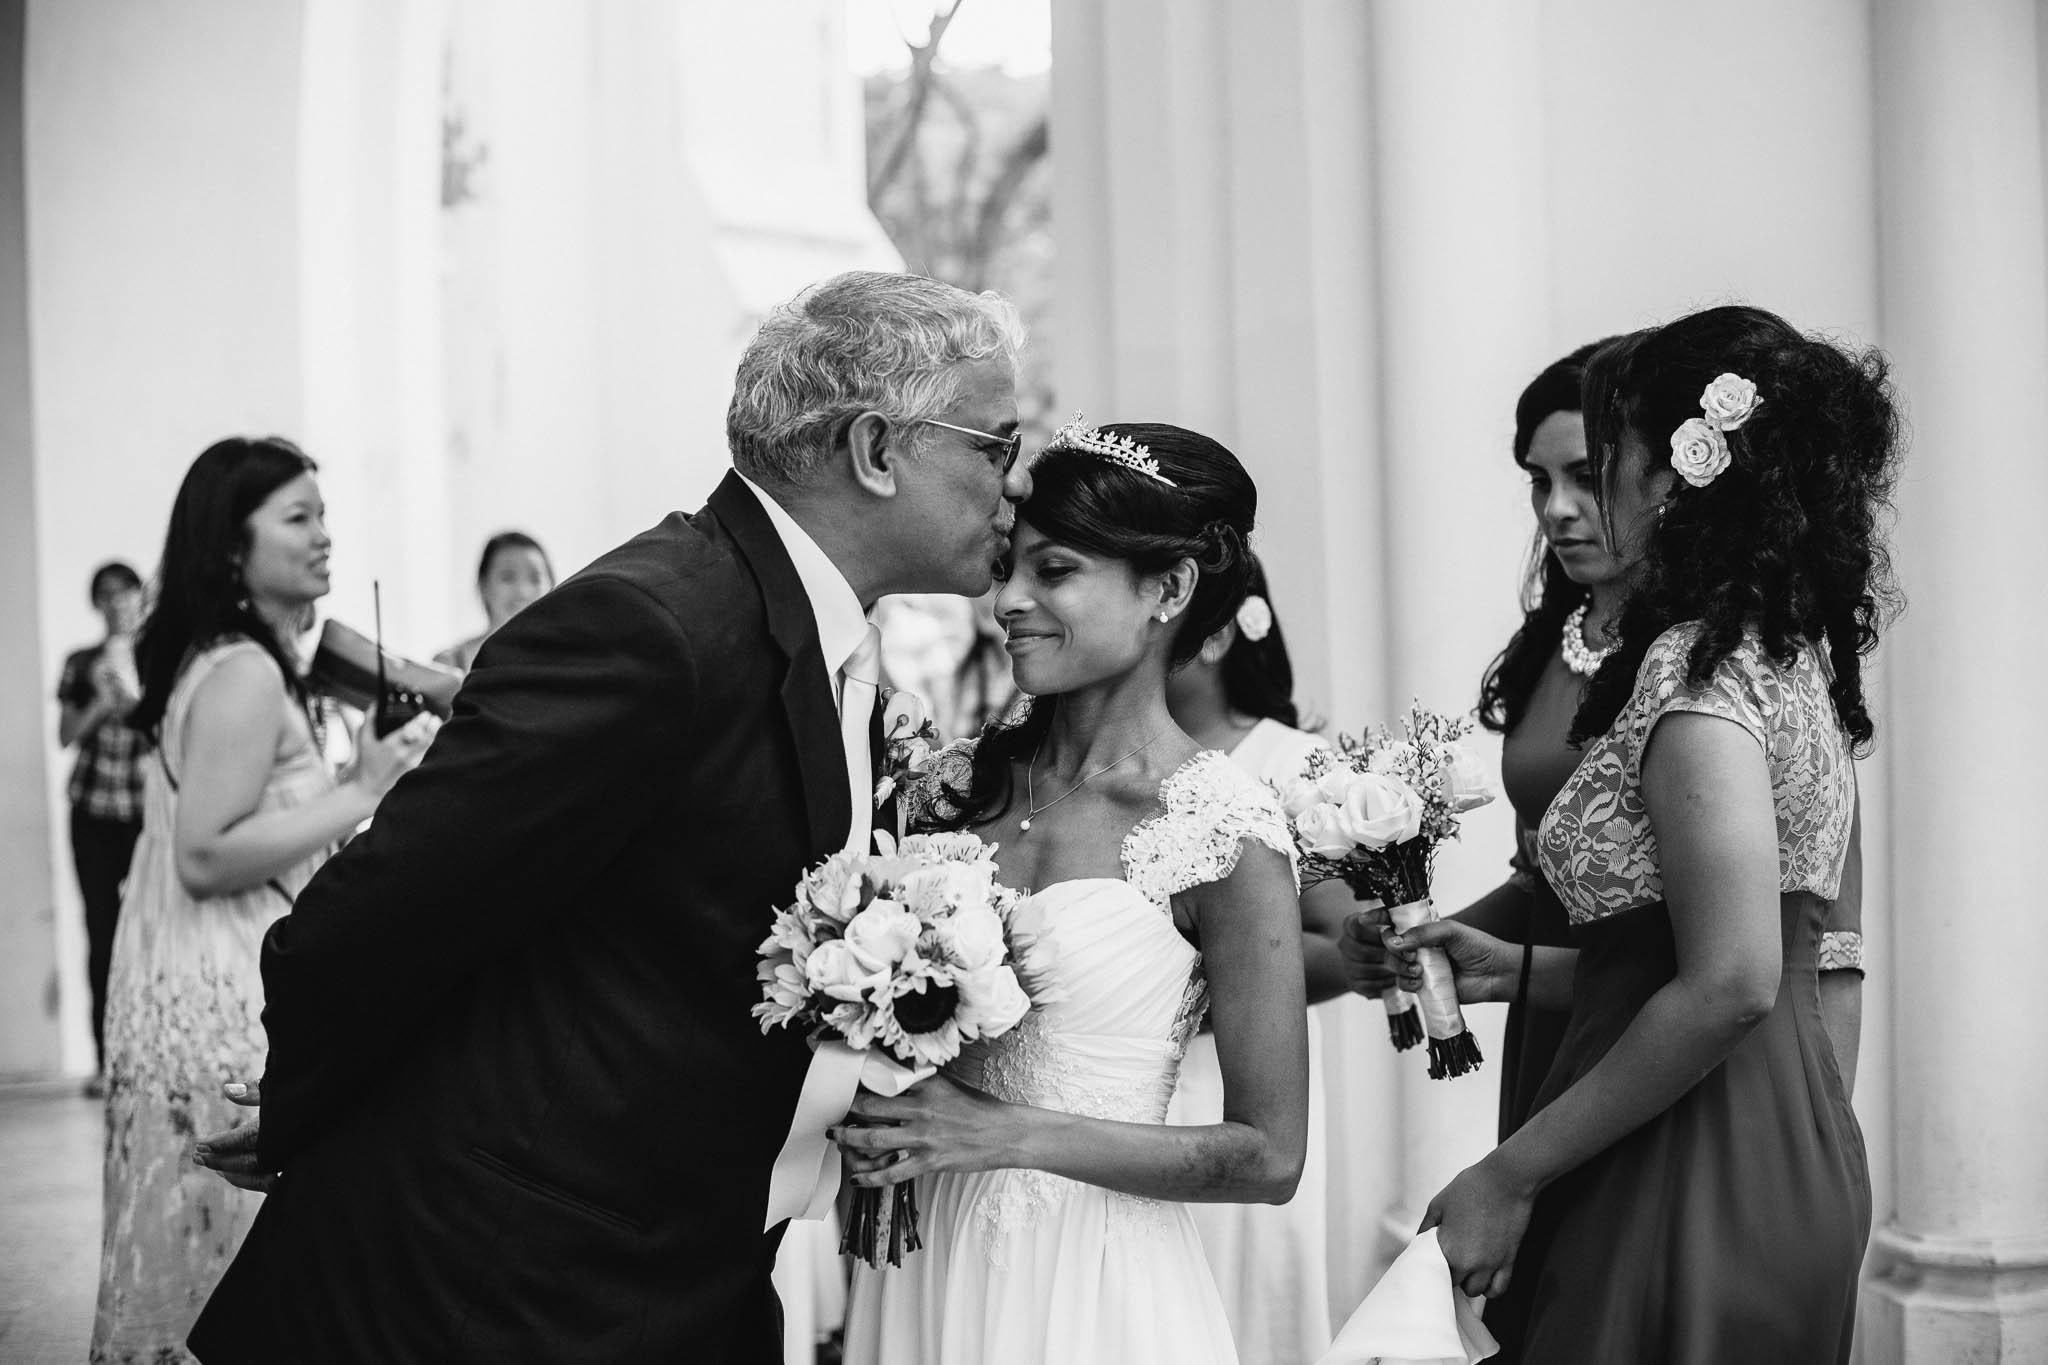 singapore-wedding-photographer-malay-indian-pre-wedding-travel-wmt-2015-39.jpg